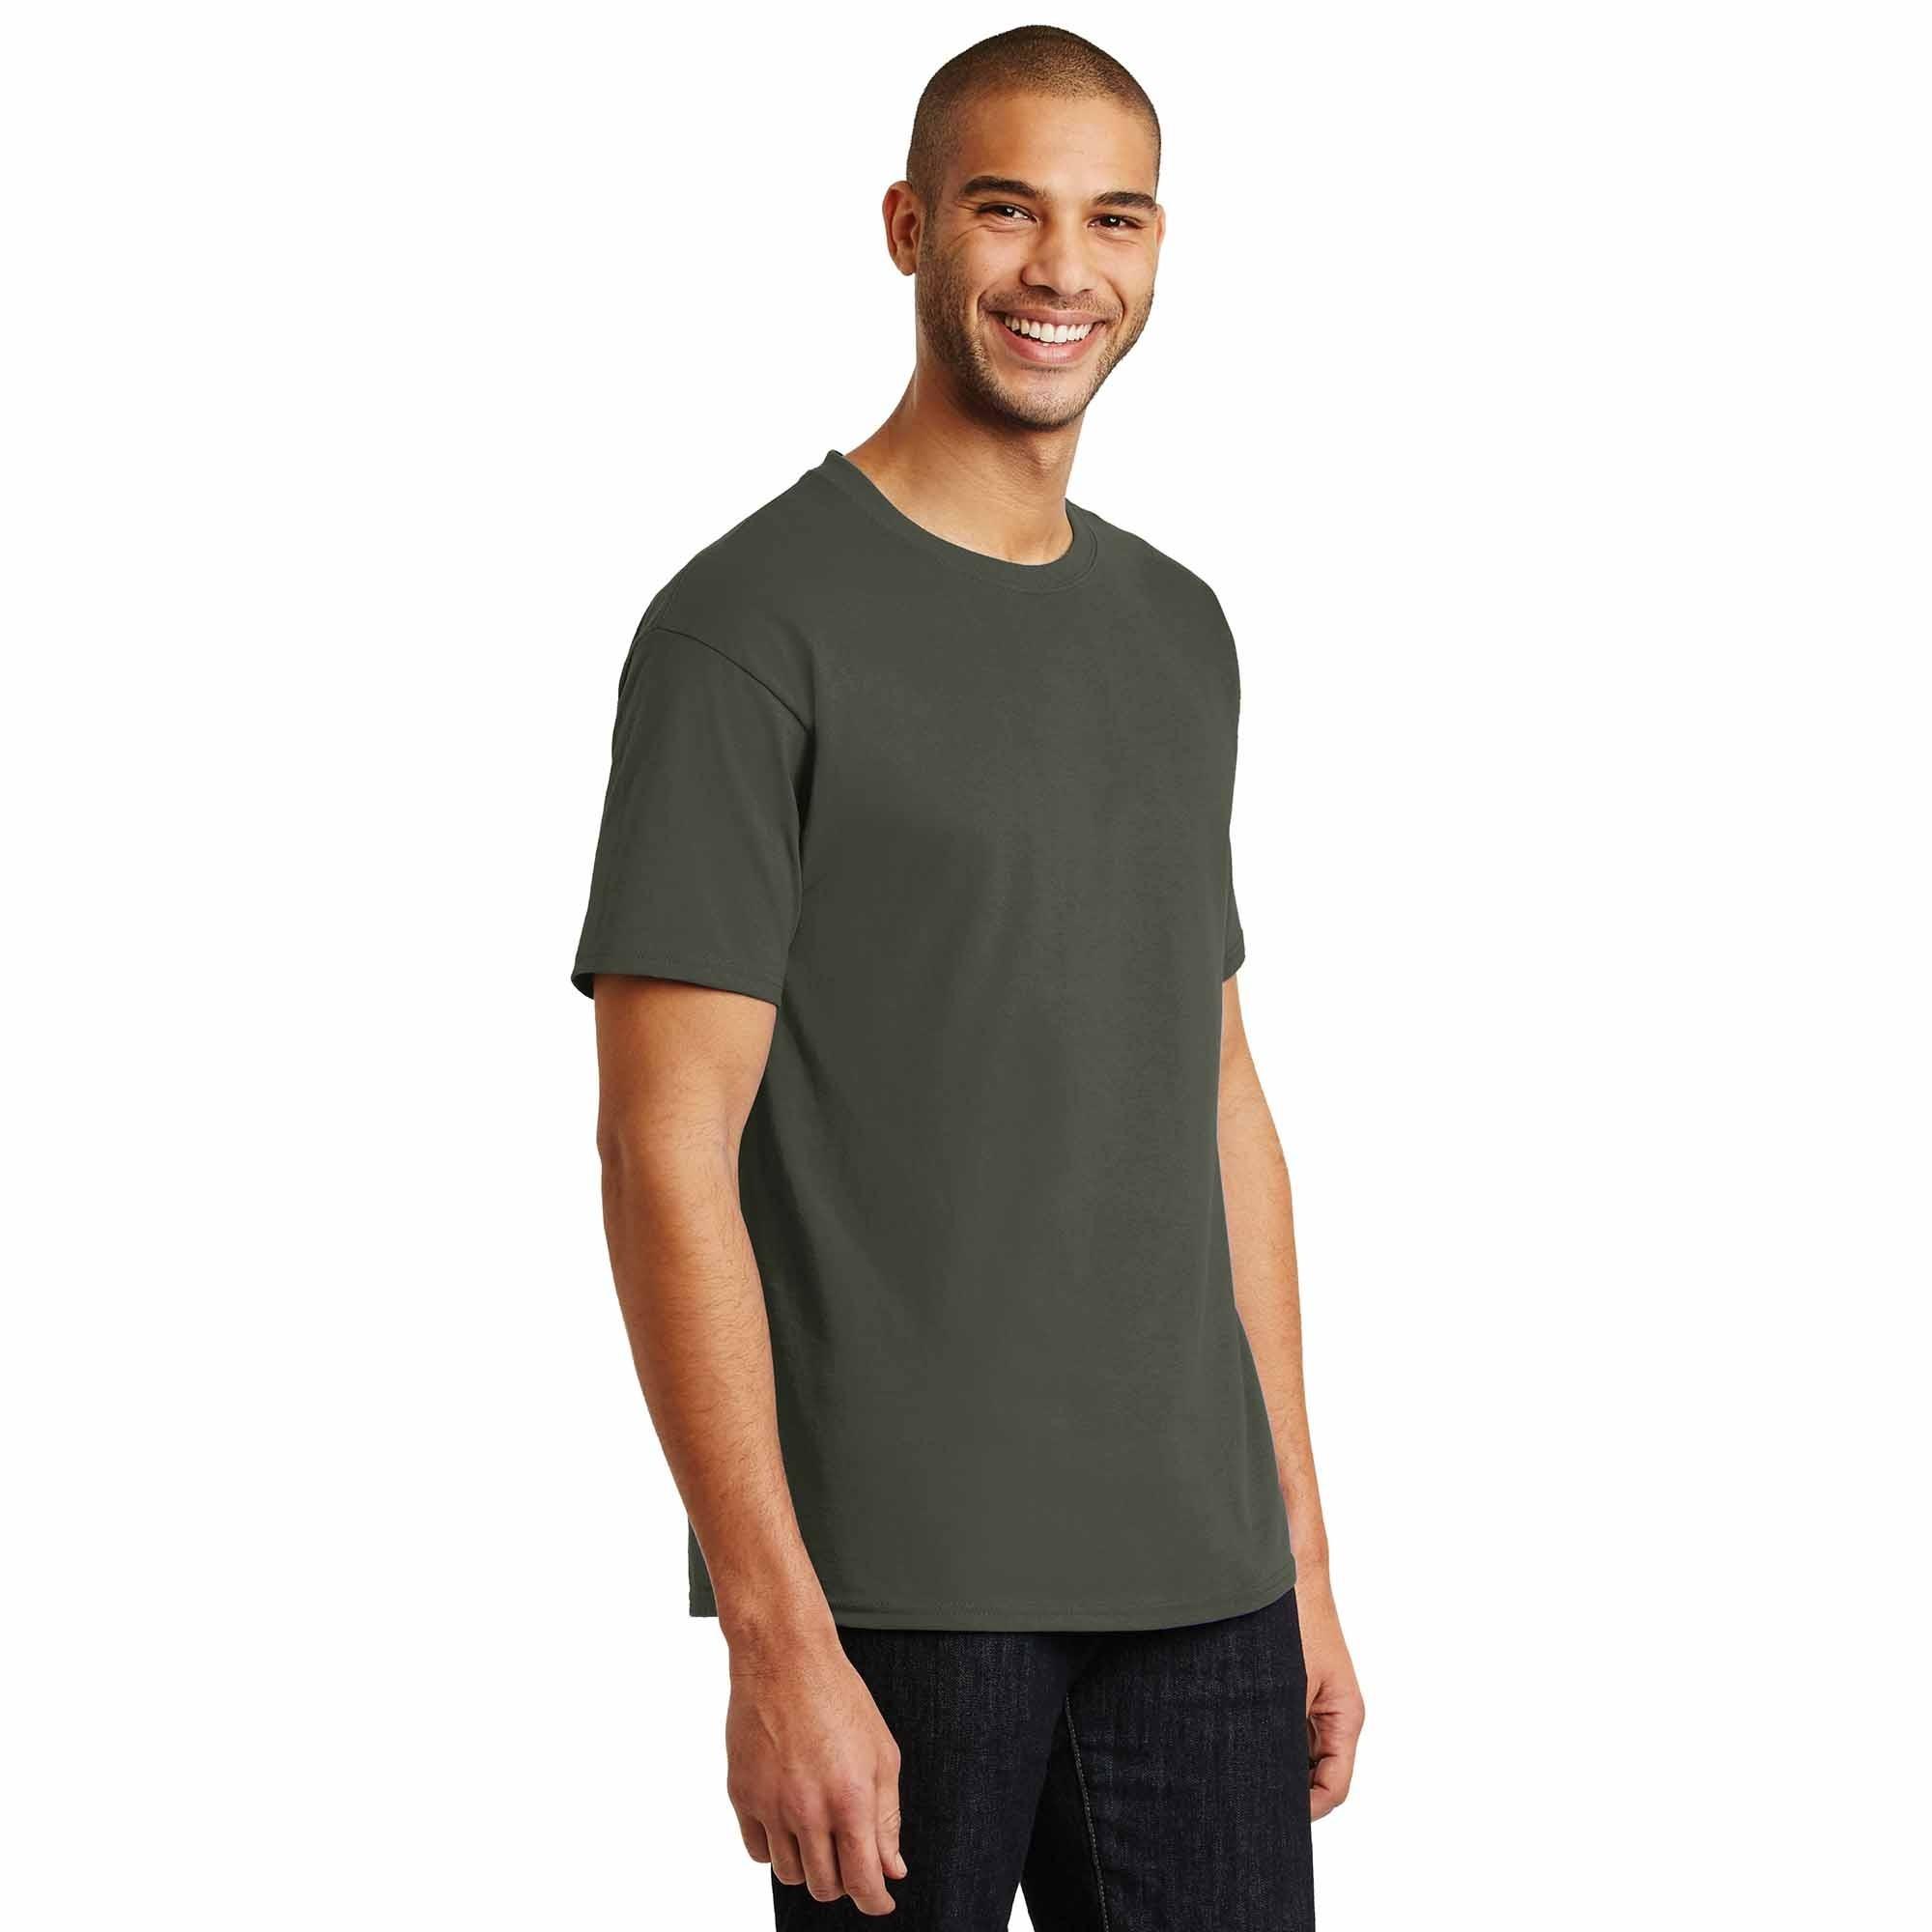 Est. 8 Pallets of Hanes Men's T-Shirts, 3 Ext. Retail $19,913, Martinsville, VA